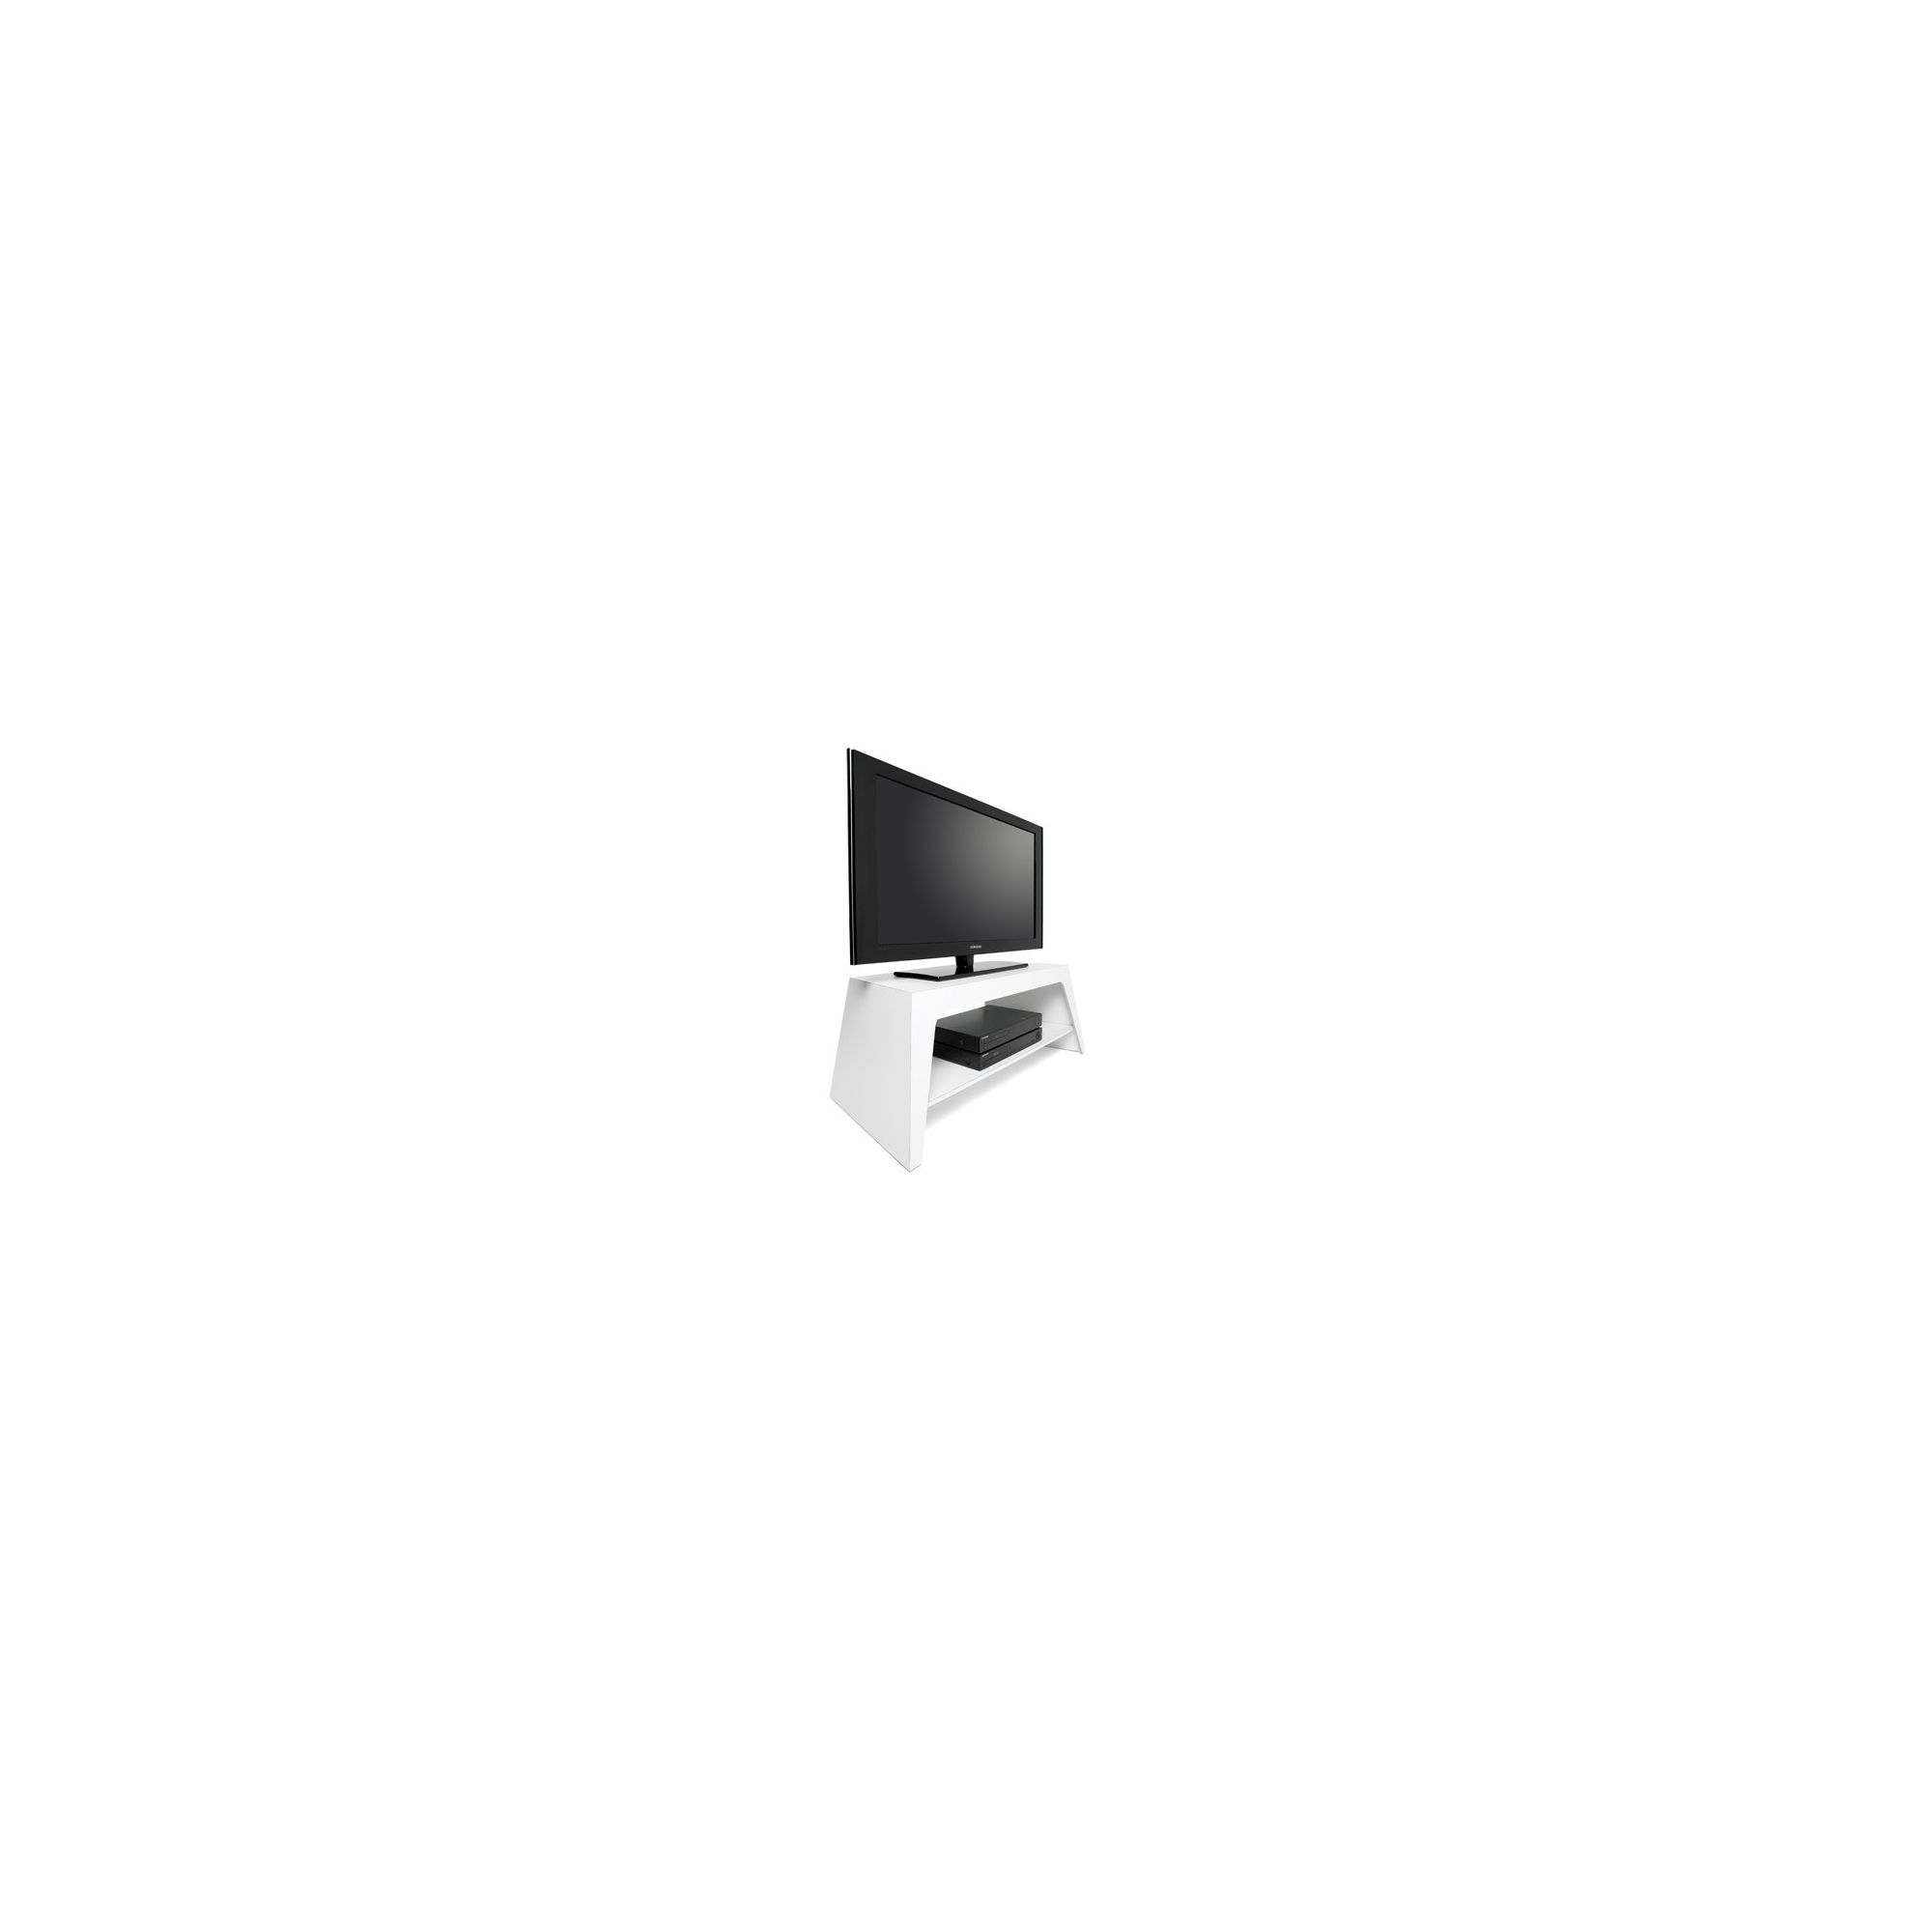 Mor Colorado TV Stand - High Gloss White at Tesco Direct